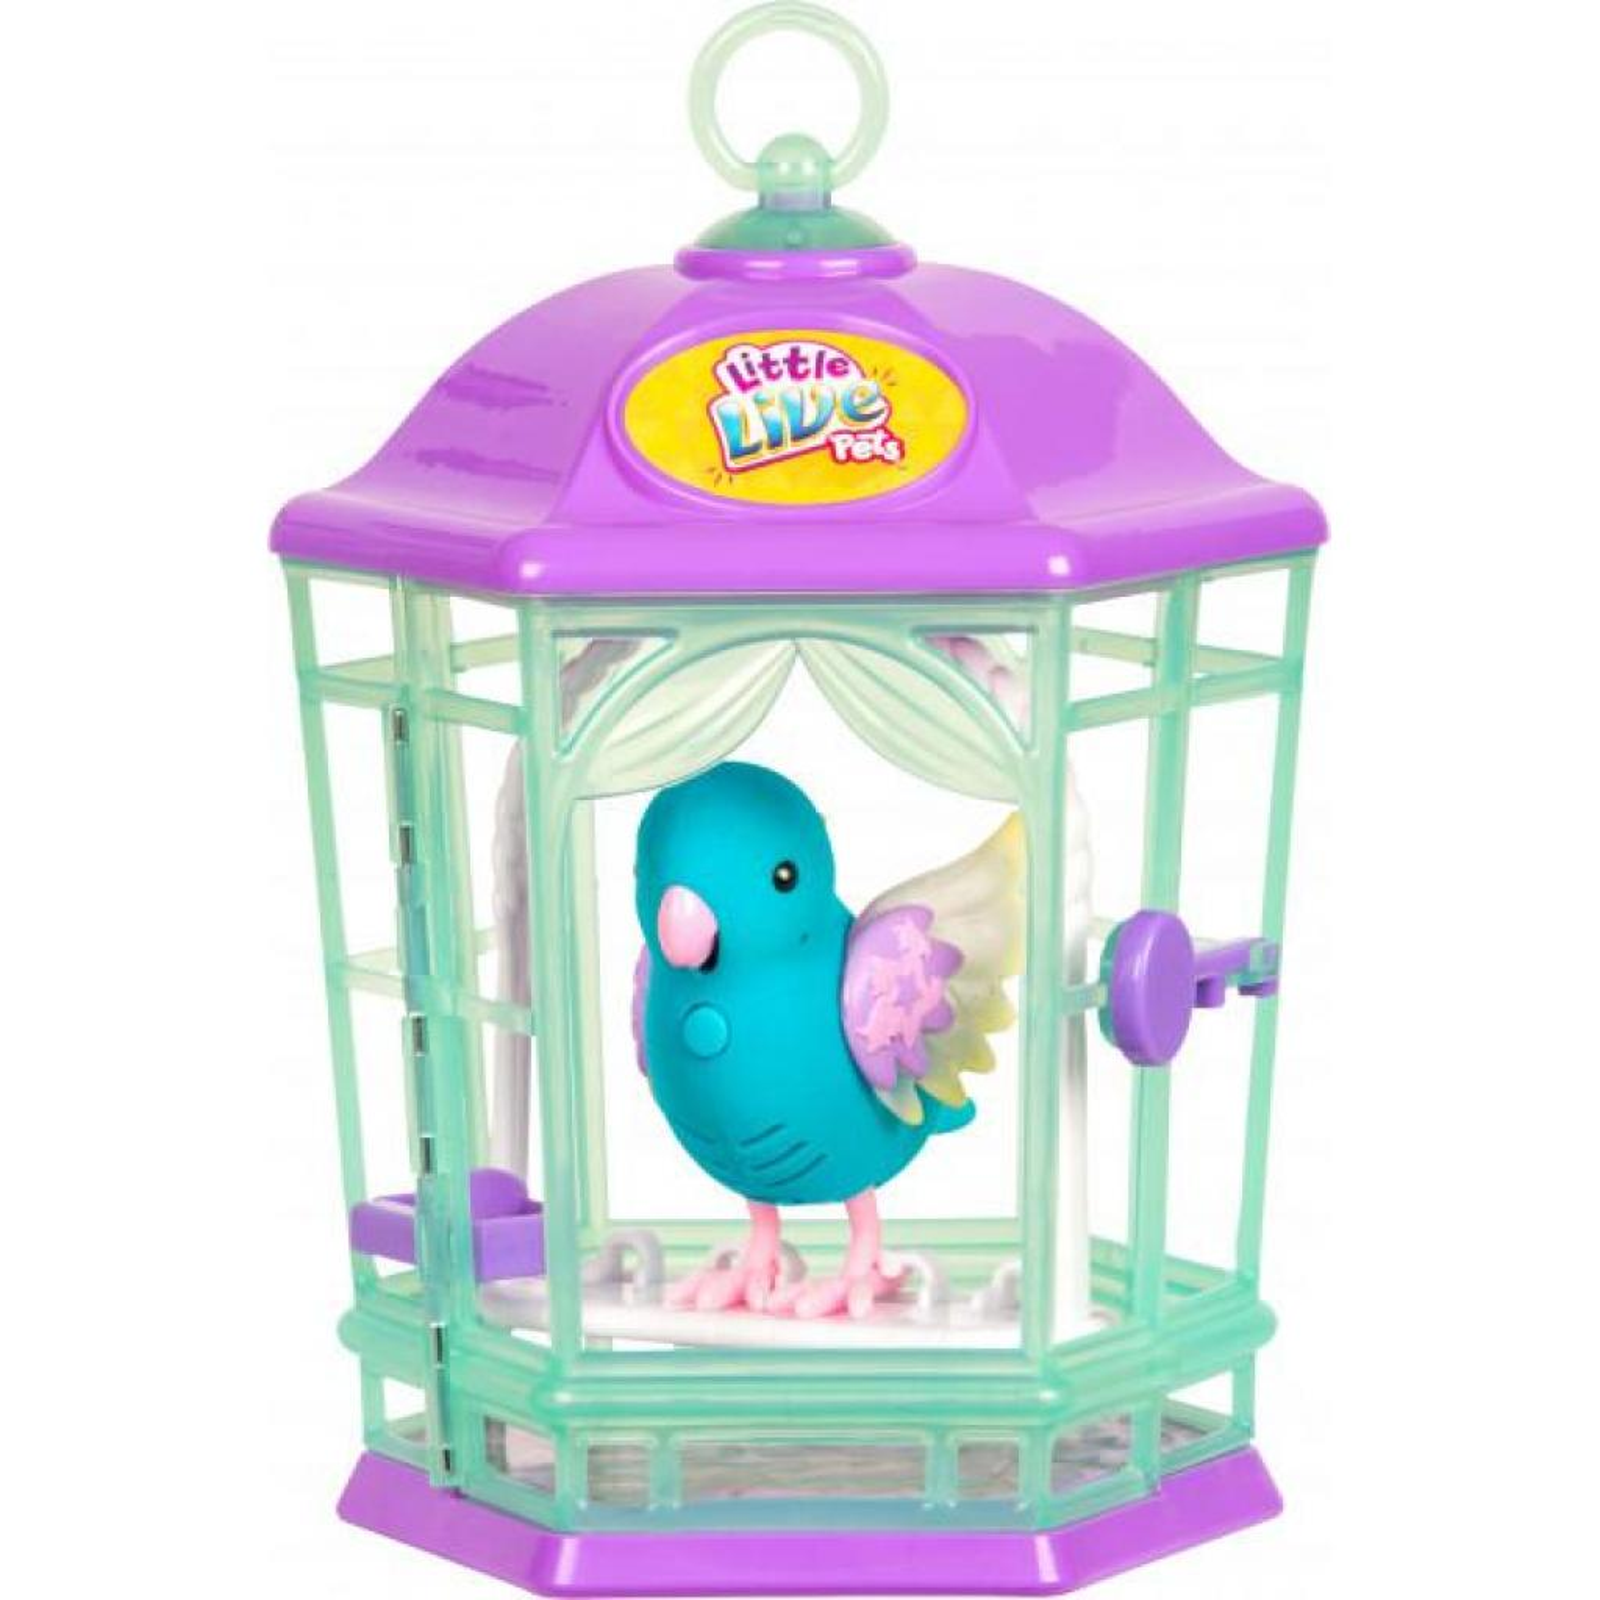 Интерактивная игрушка Moose Птичка в клетке Little Live Pets Skye Twinkles (28548)